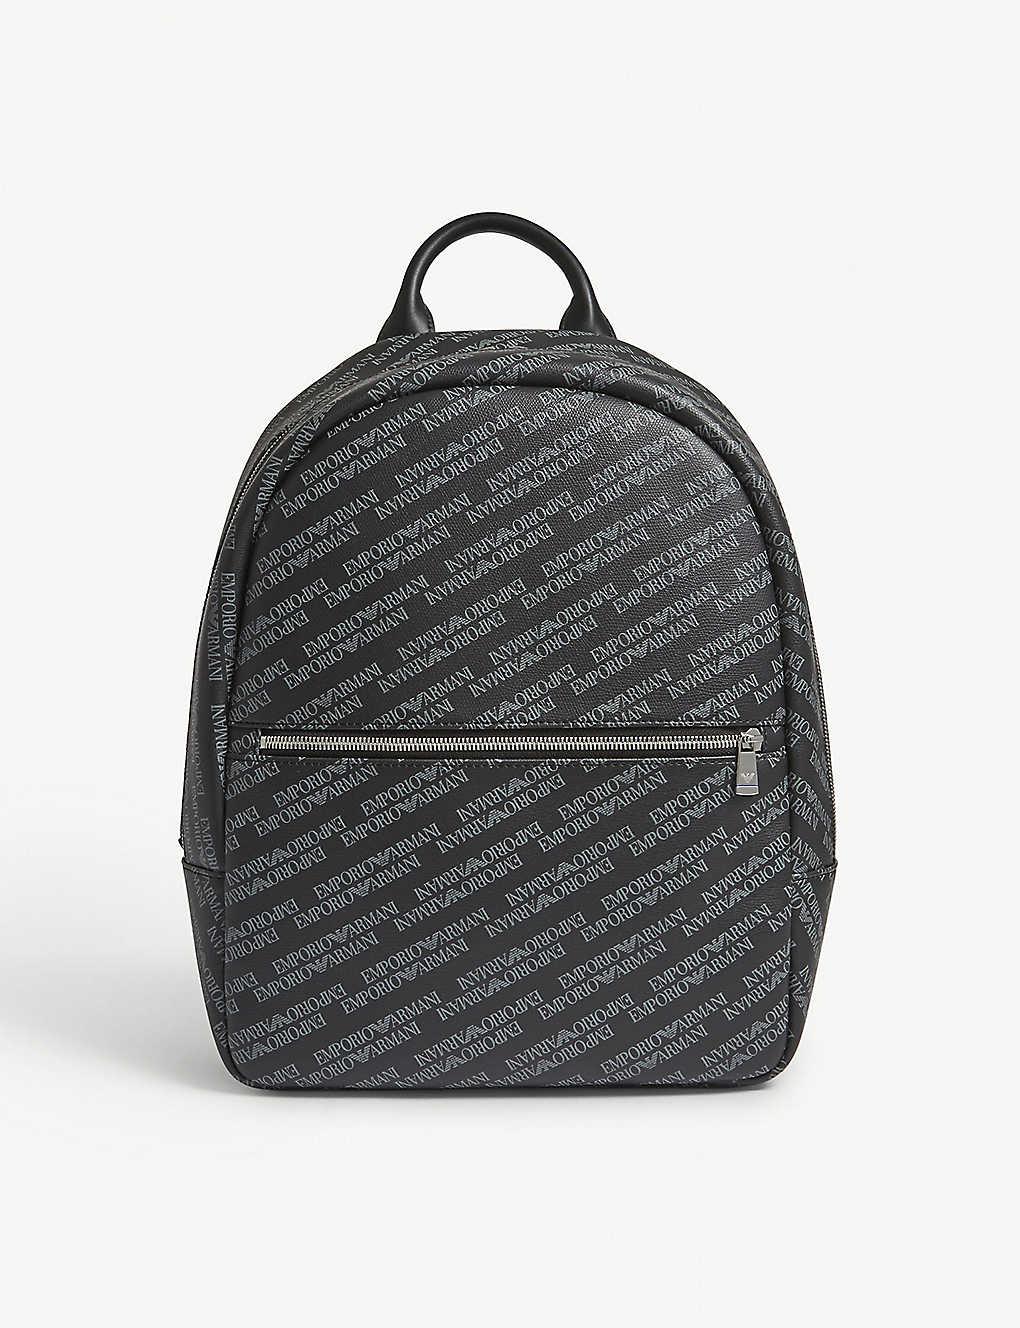 EMPORIO ARMANI - Logo-print leather backpack  4ff83165ab584